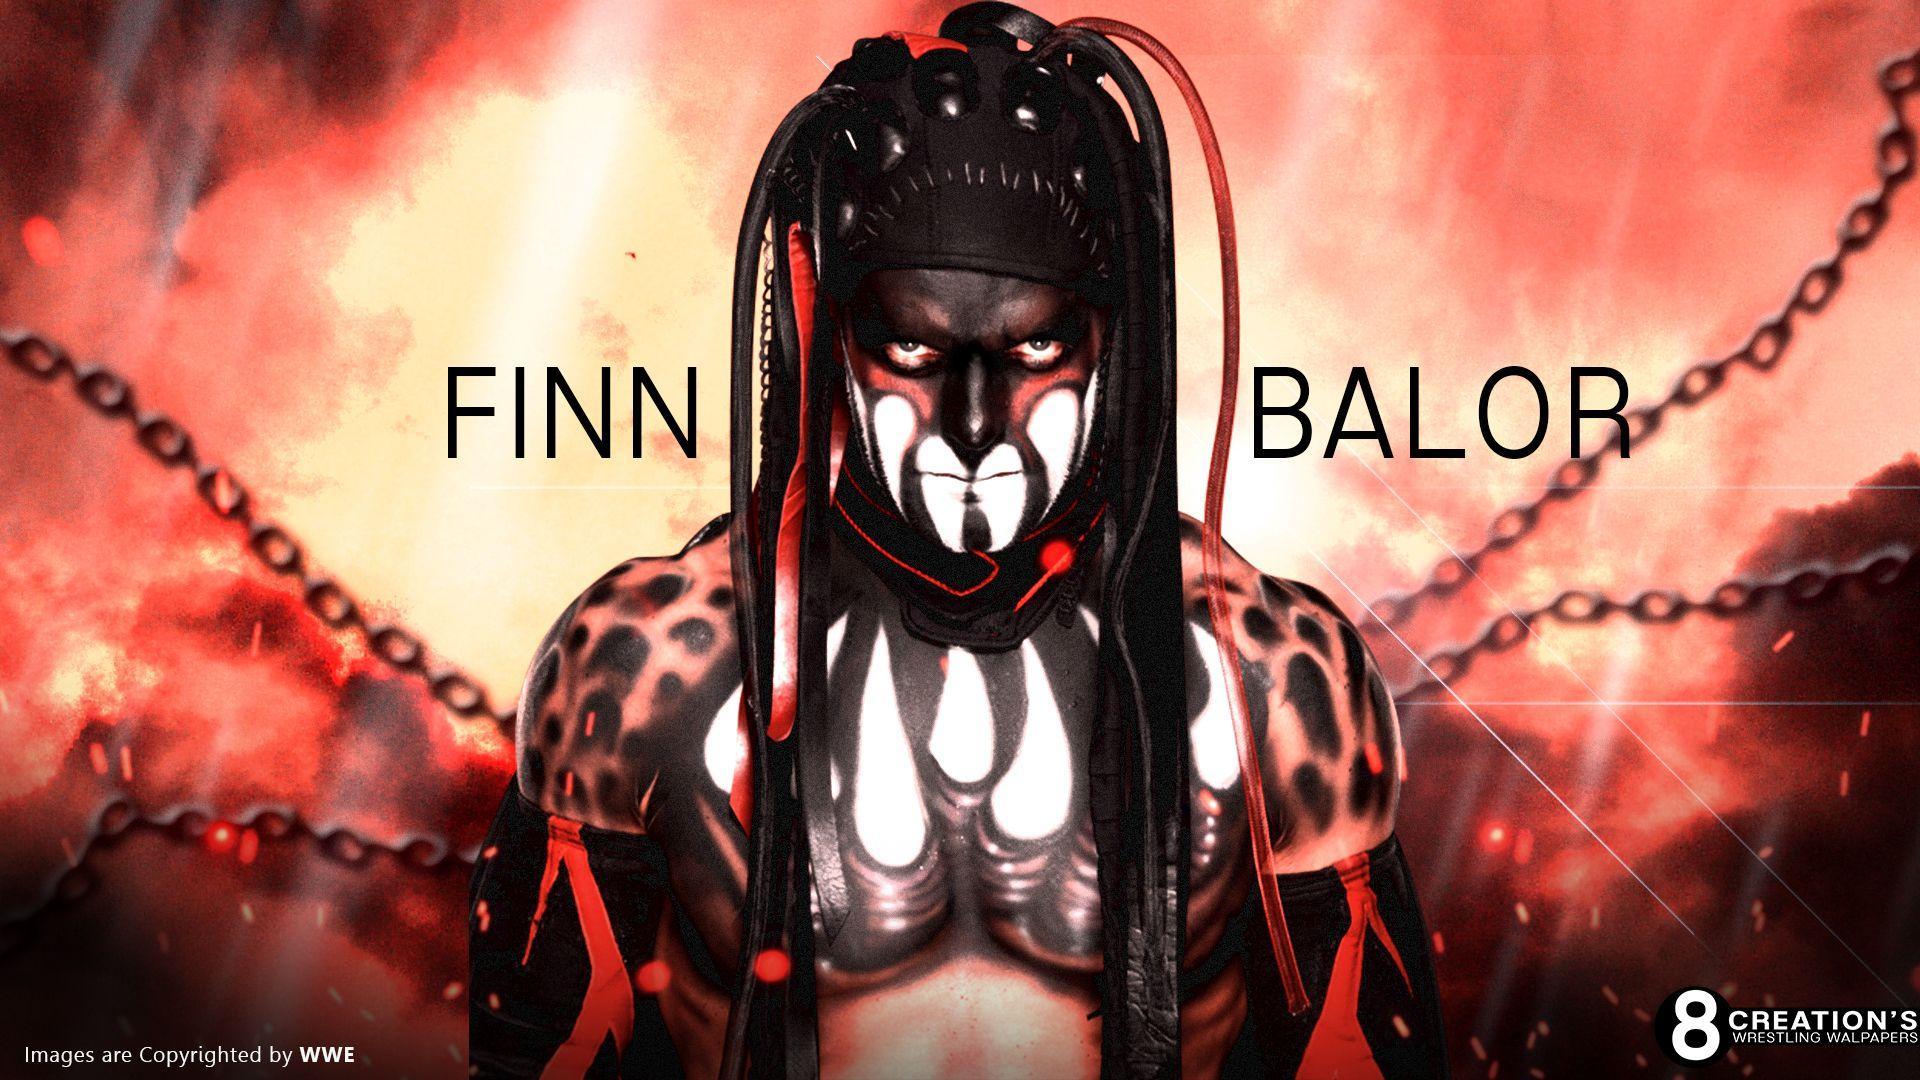 finn balor wallpaper - photo #5